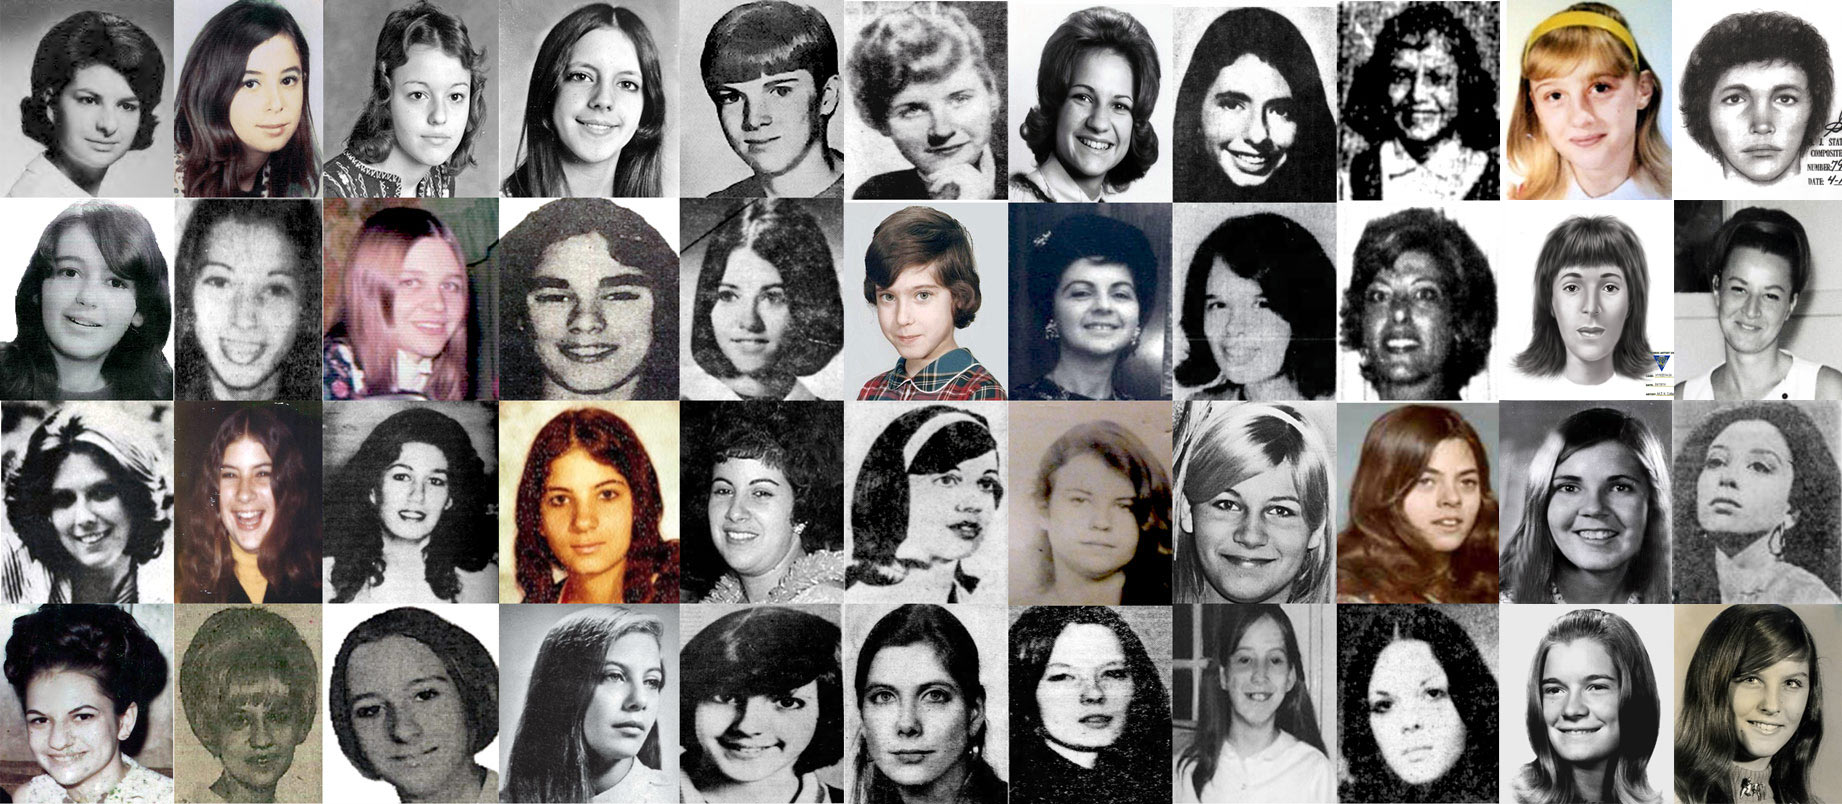 Cases New Jersey Girl Murders